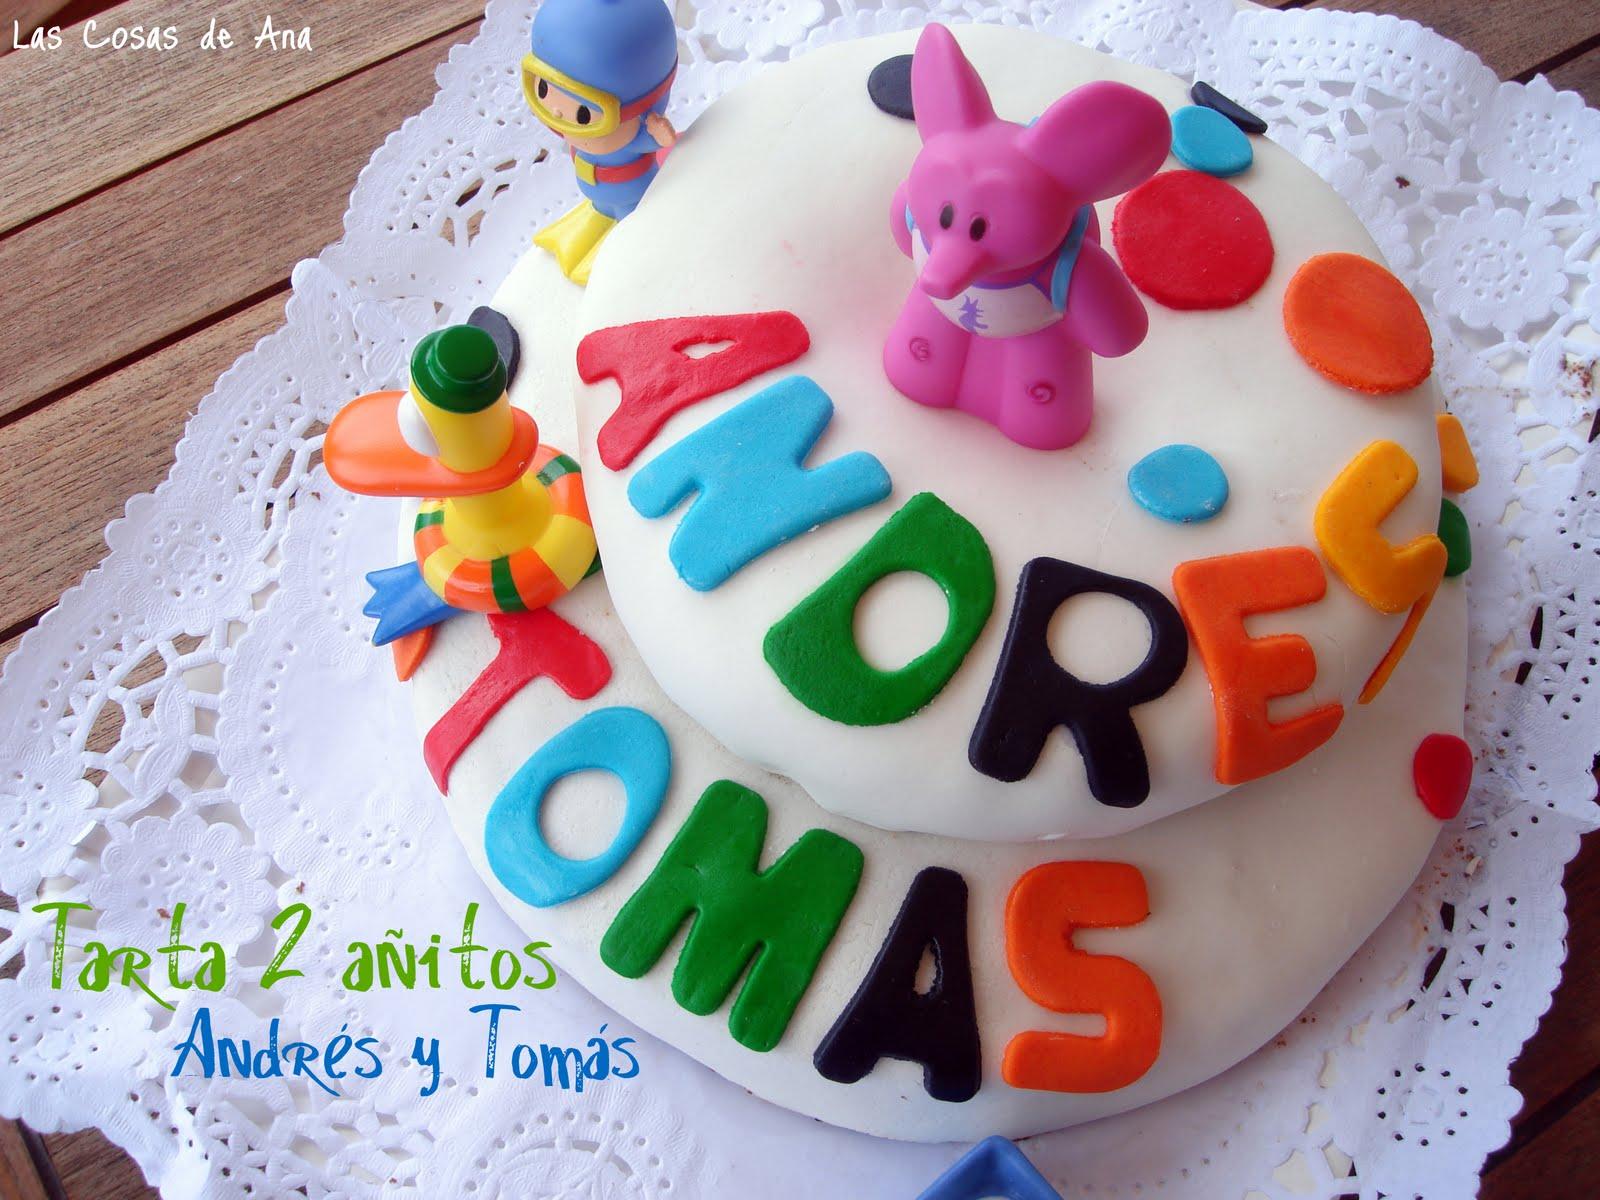 Las cosas de ana tarta fondant - Detalles originales para cumpleanos infantiles ...